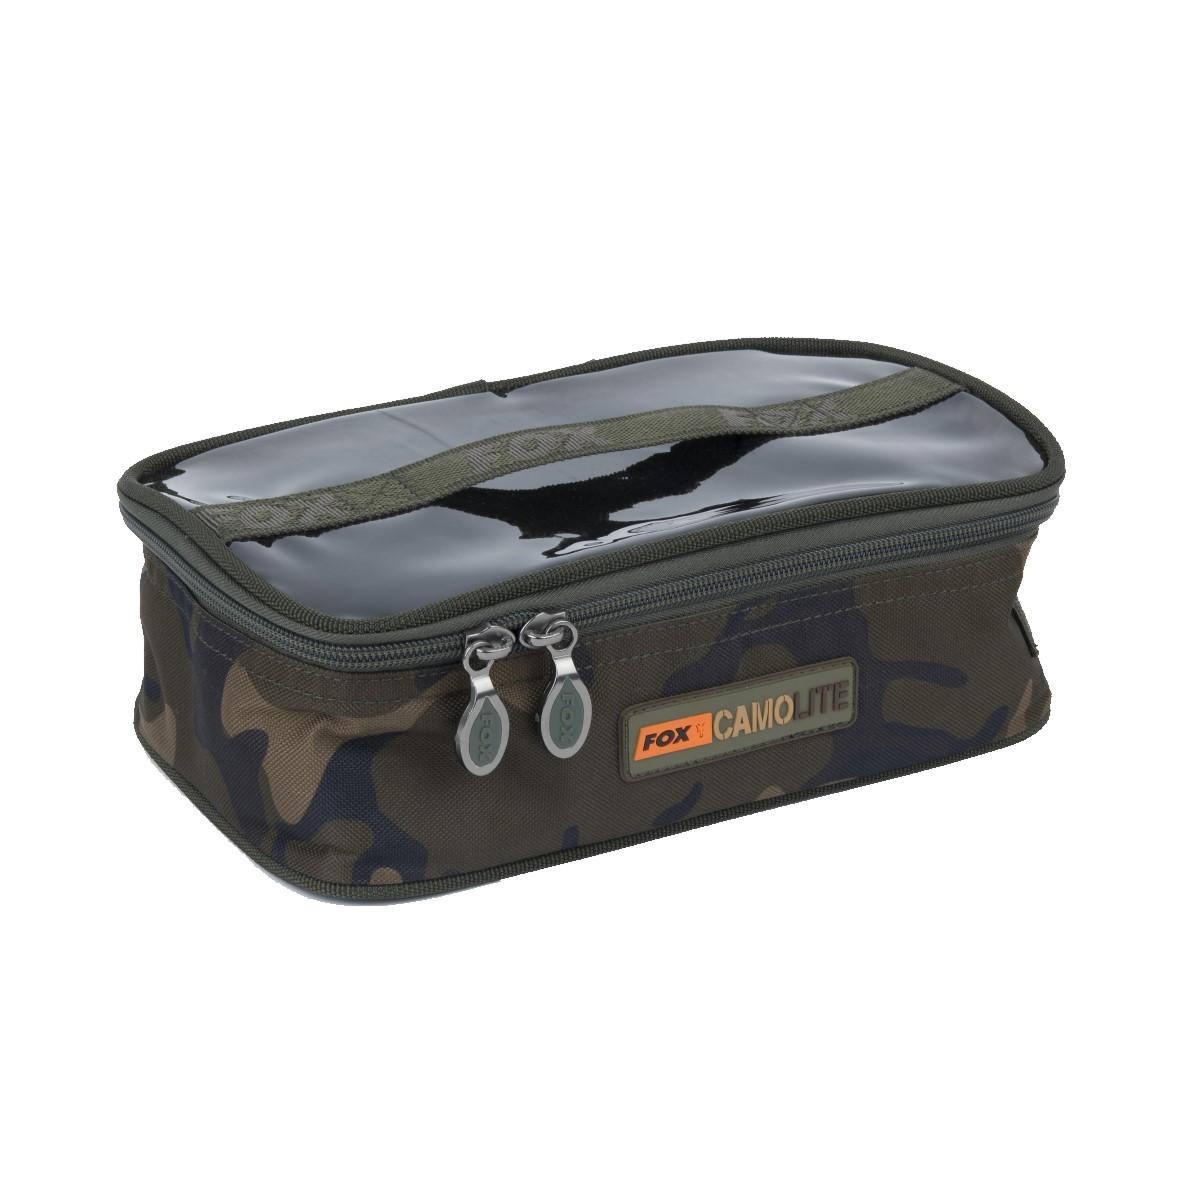 Чанта за риболовни аксесоари Fox Camolite Accessory Bags Medium